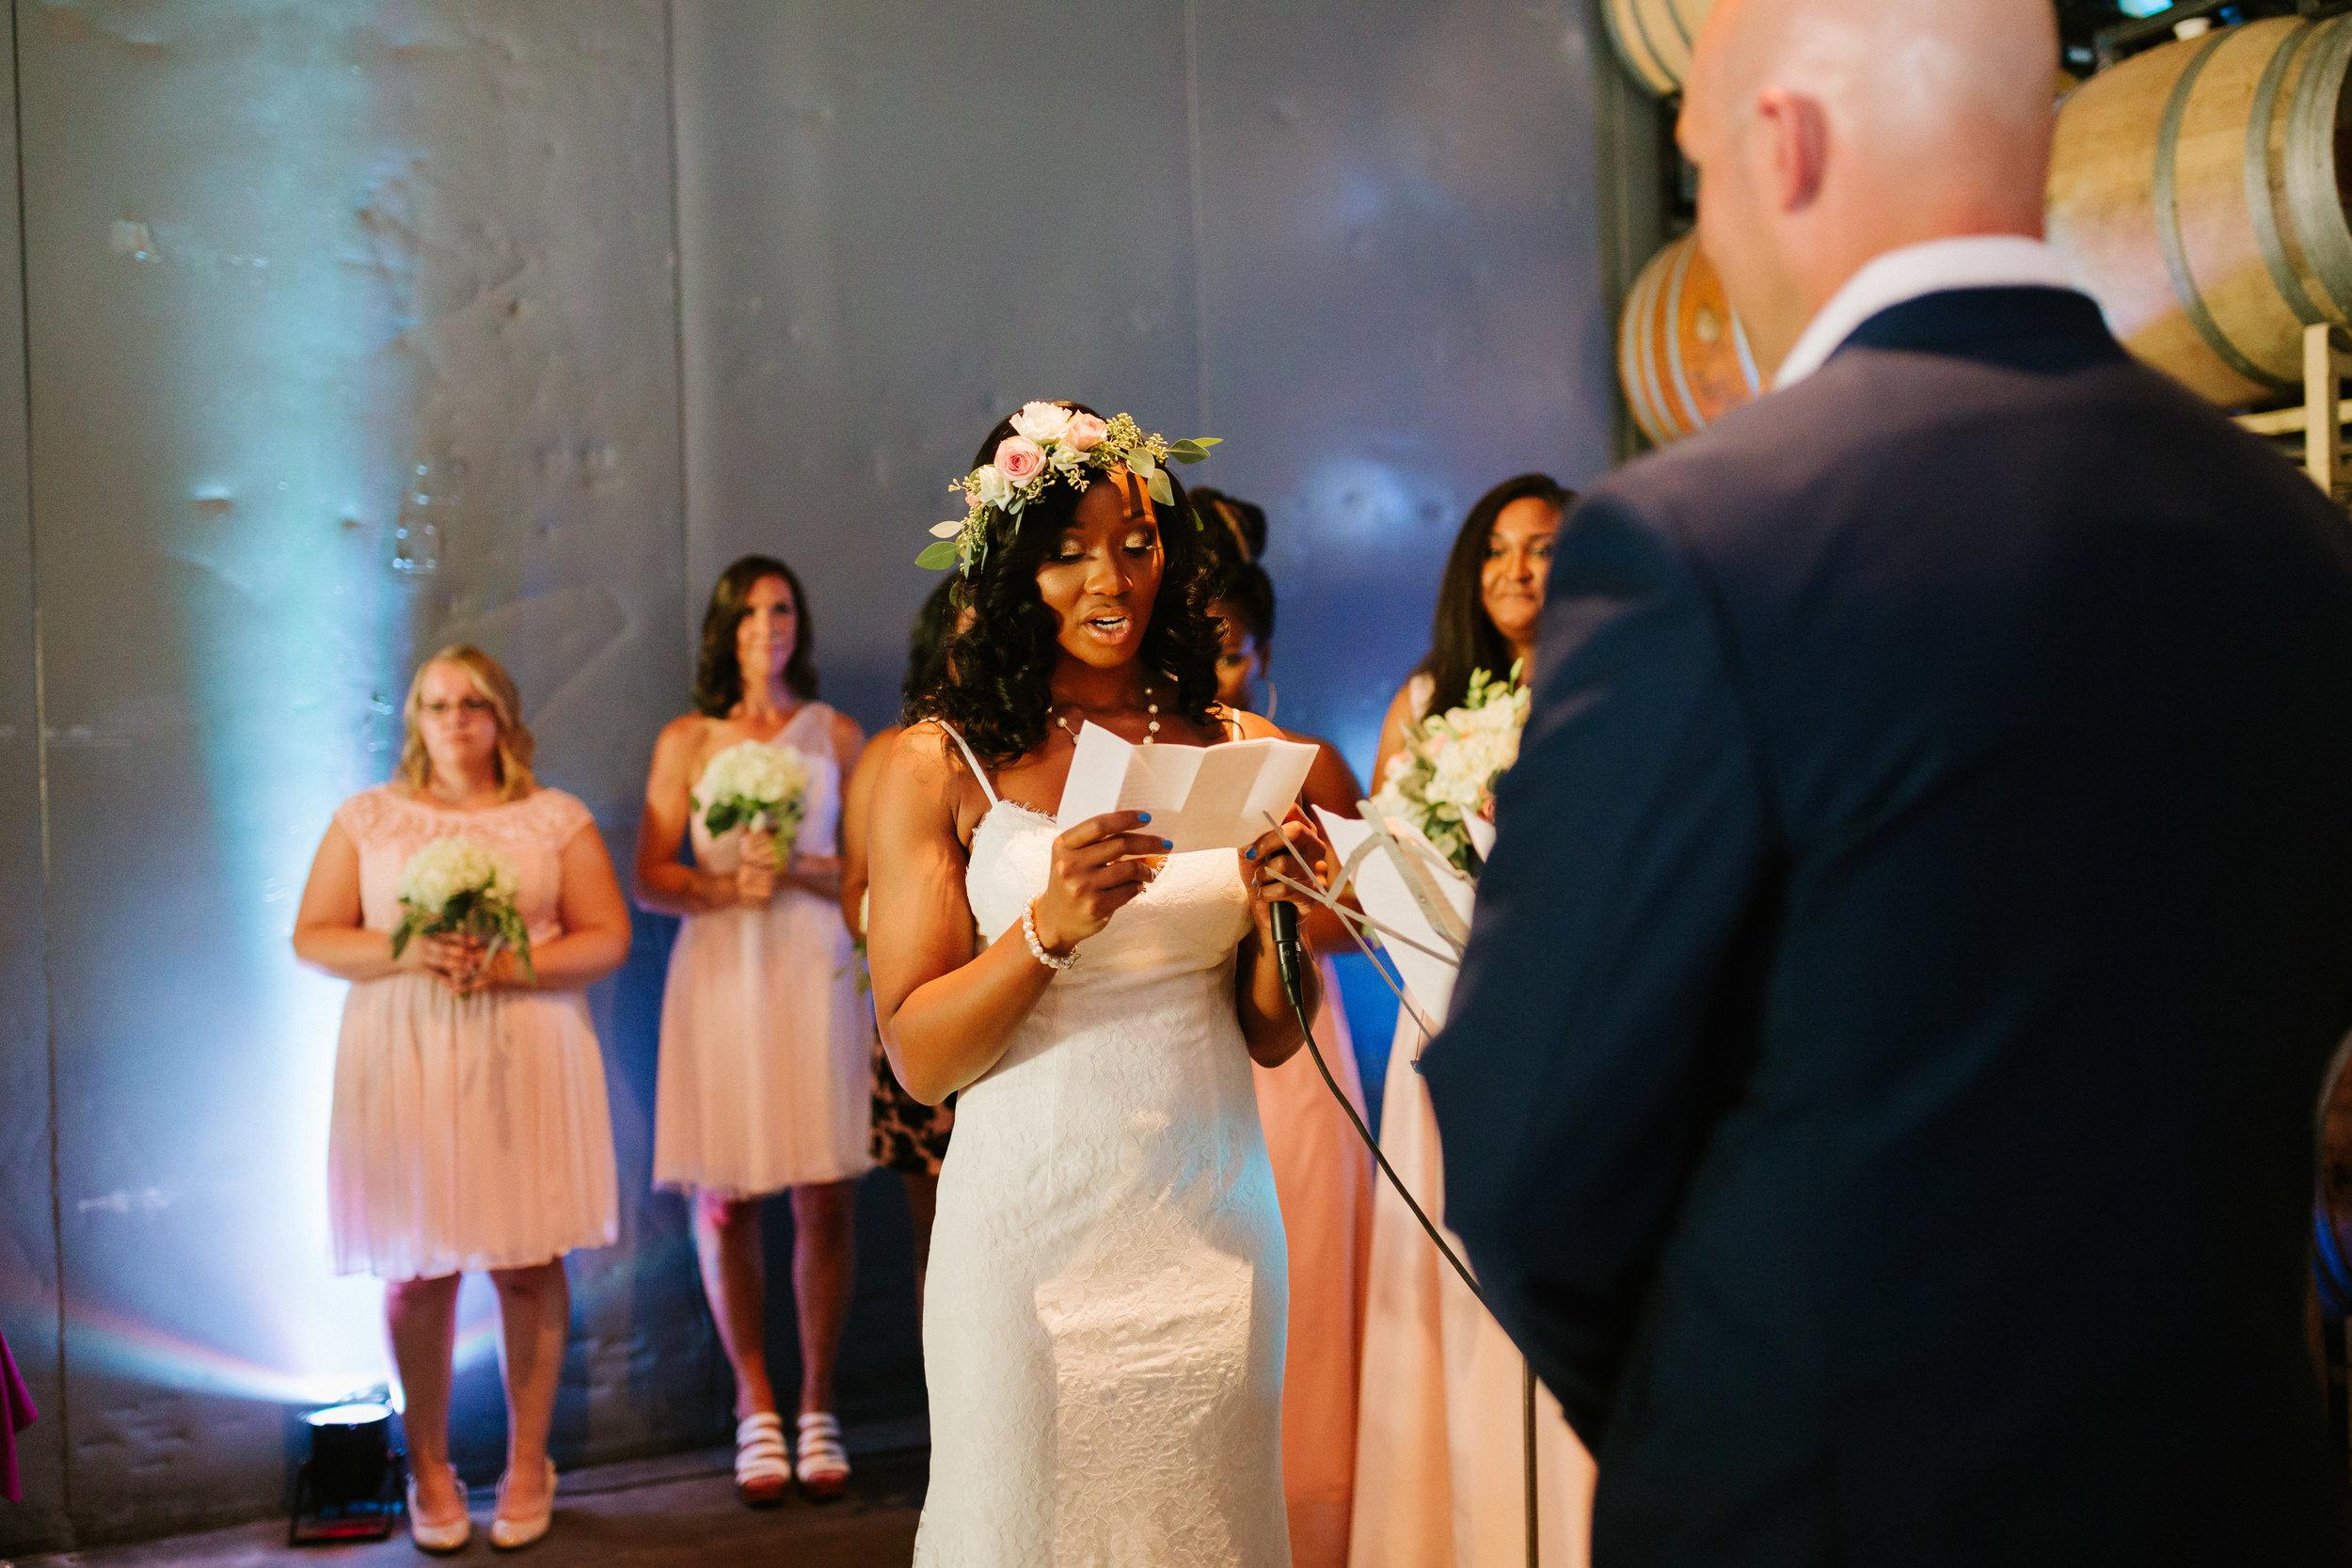 2017.09.16 Ashley and Chuck O'Day Quantam Leap Winery Wedding (168 of 462).jpg